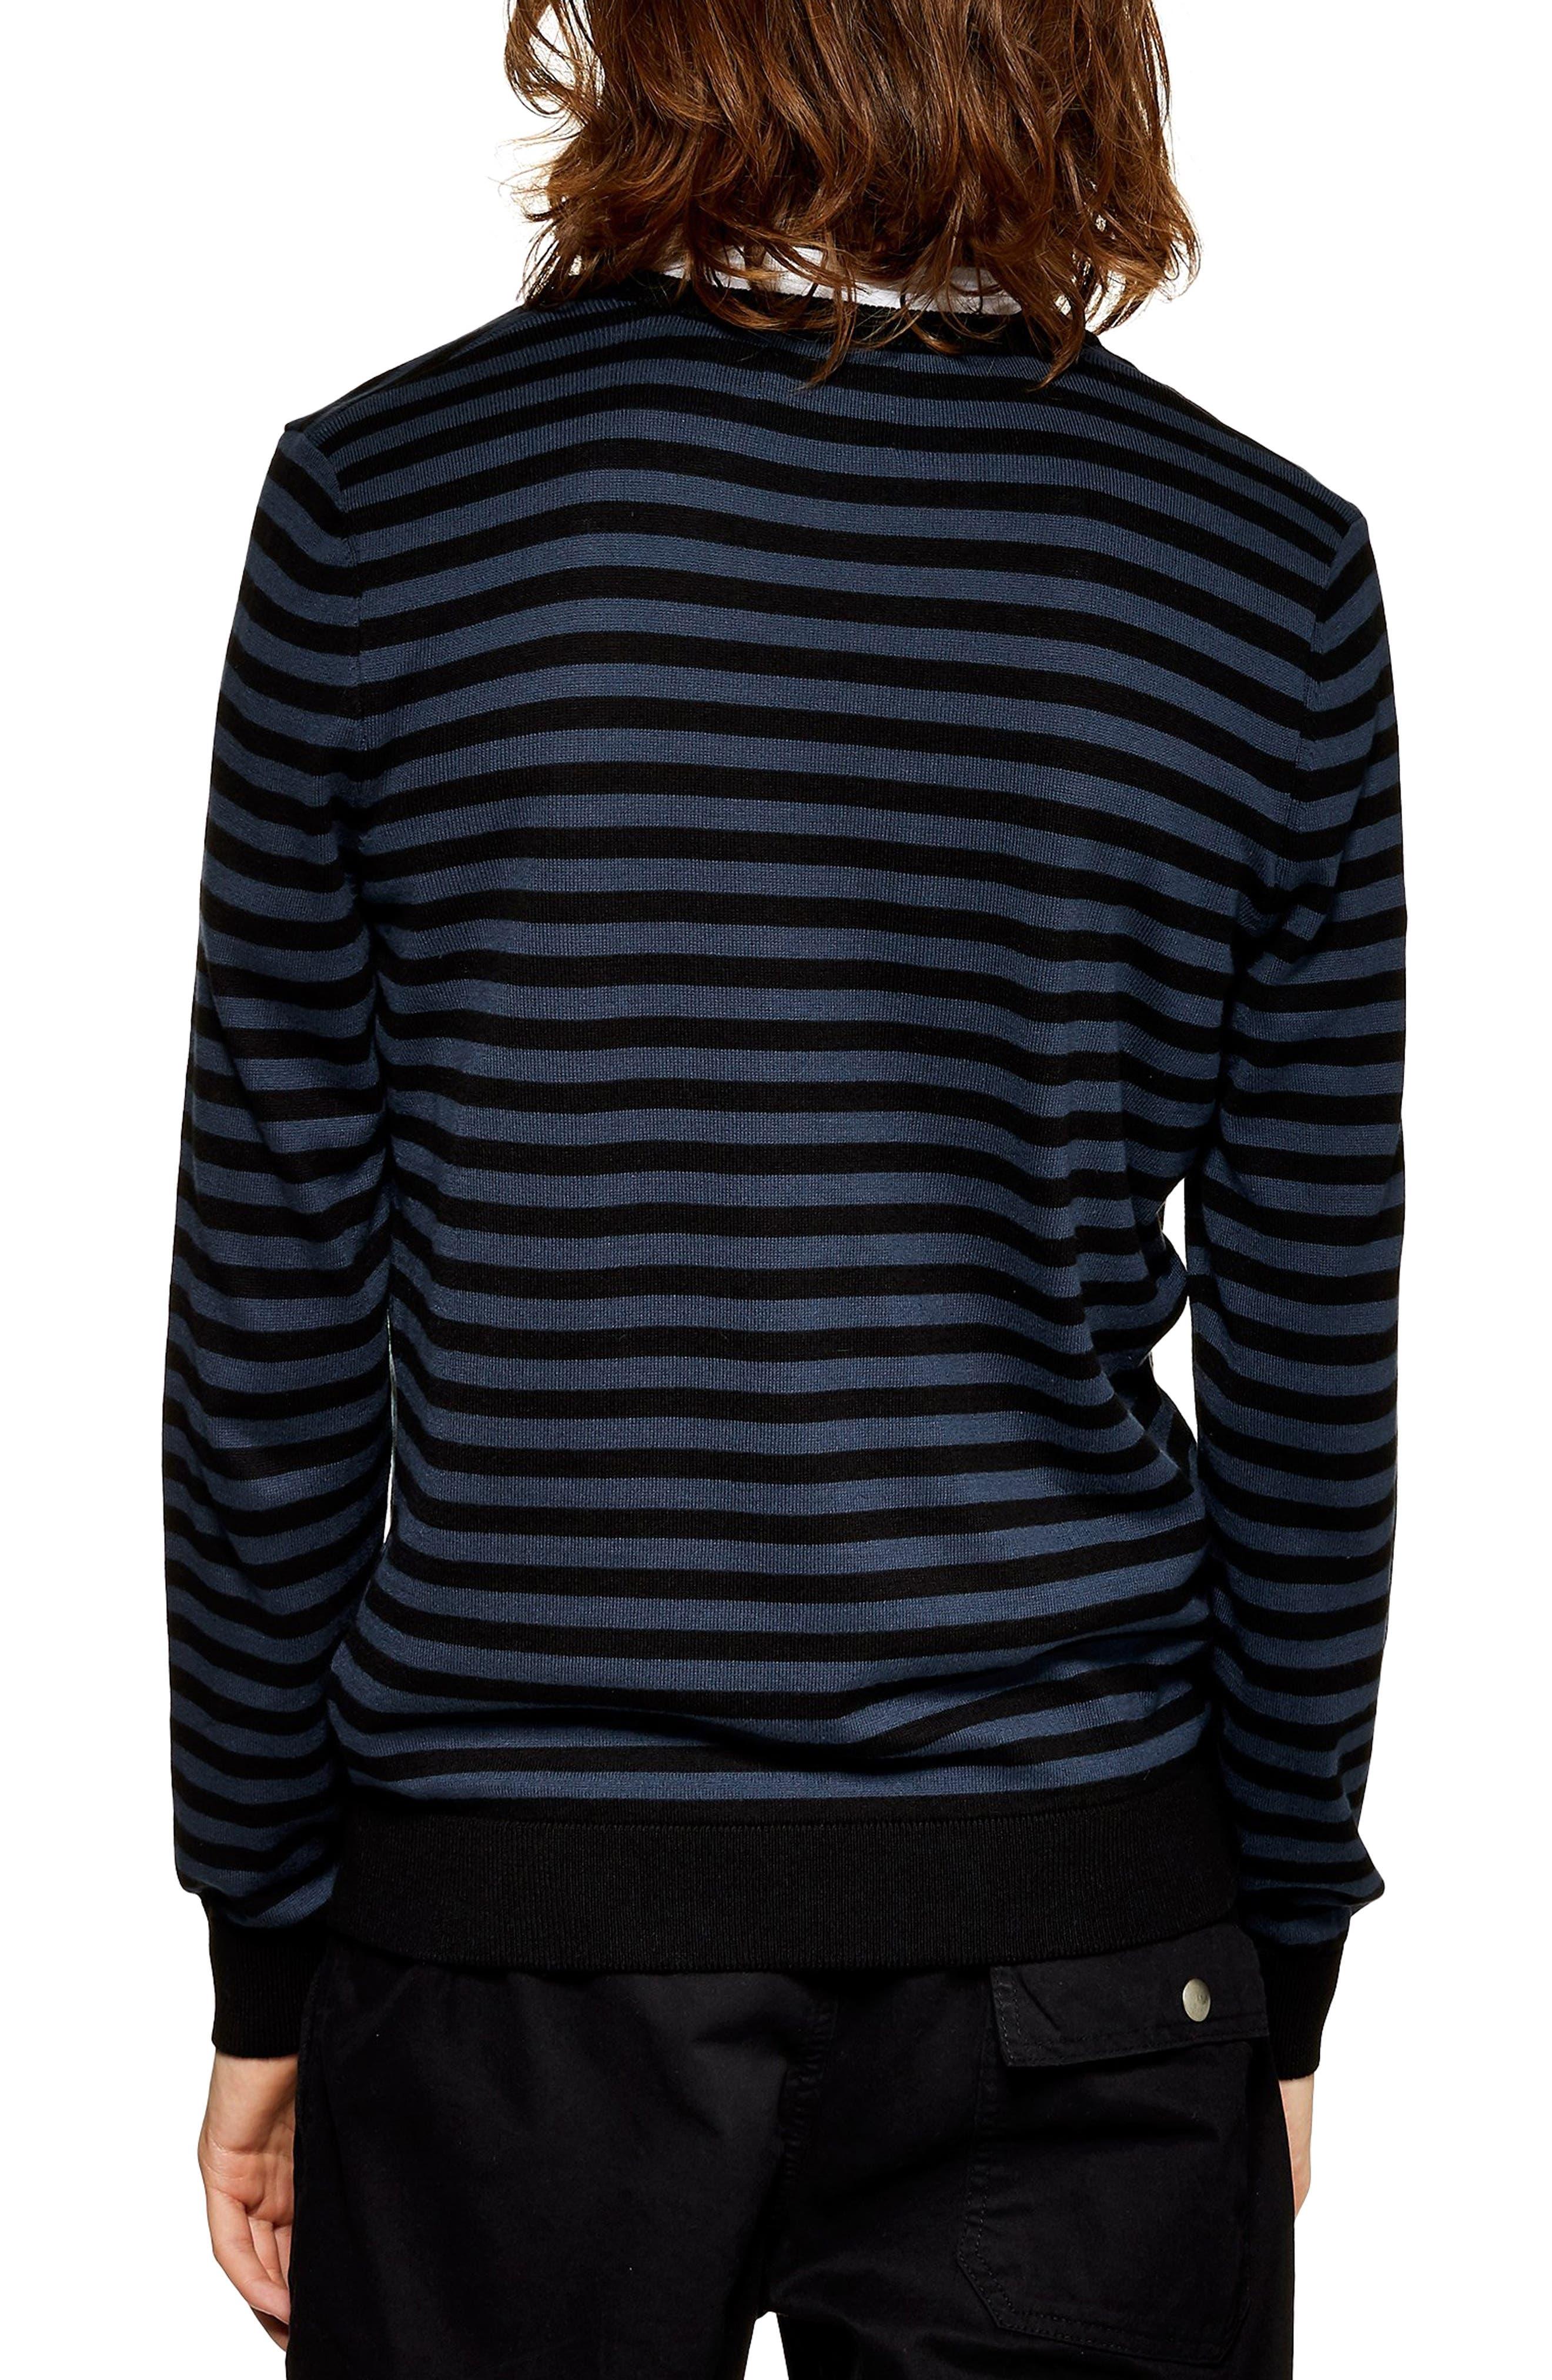 TOPMAN, Stripe V-Neck Sweater, Alternate thumbnail 2, color, BLUE MULTI